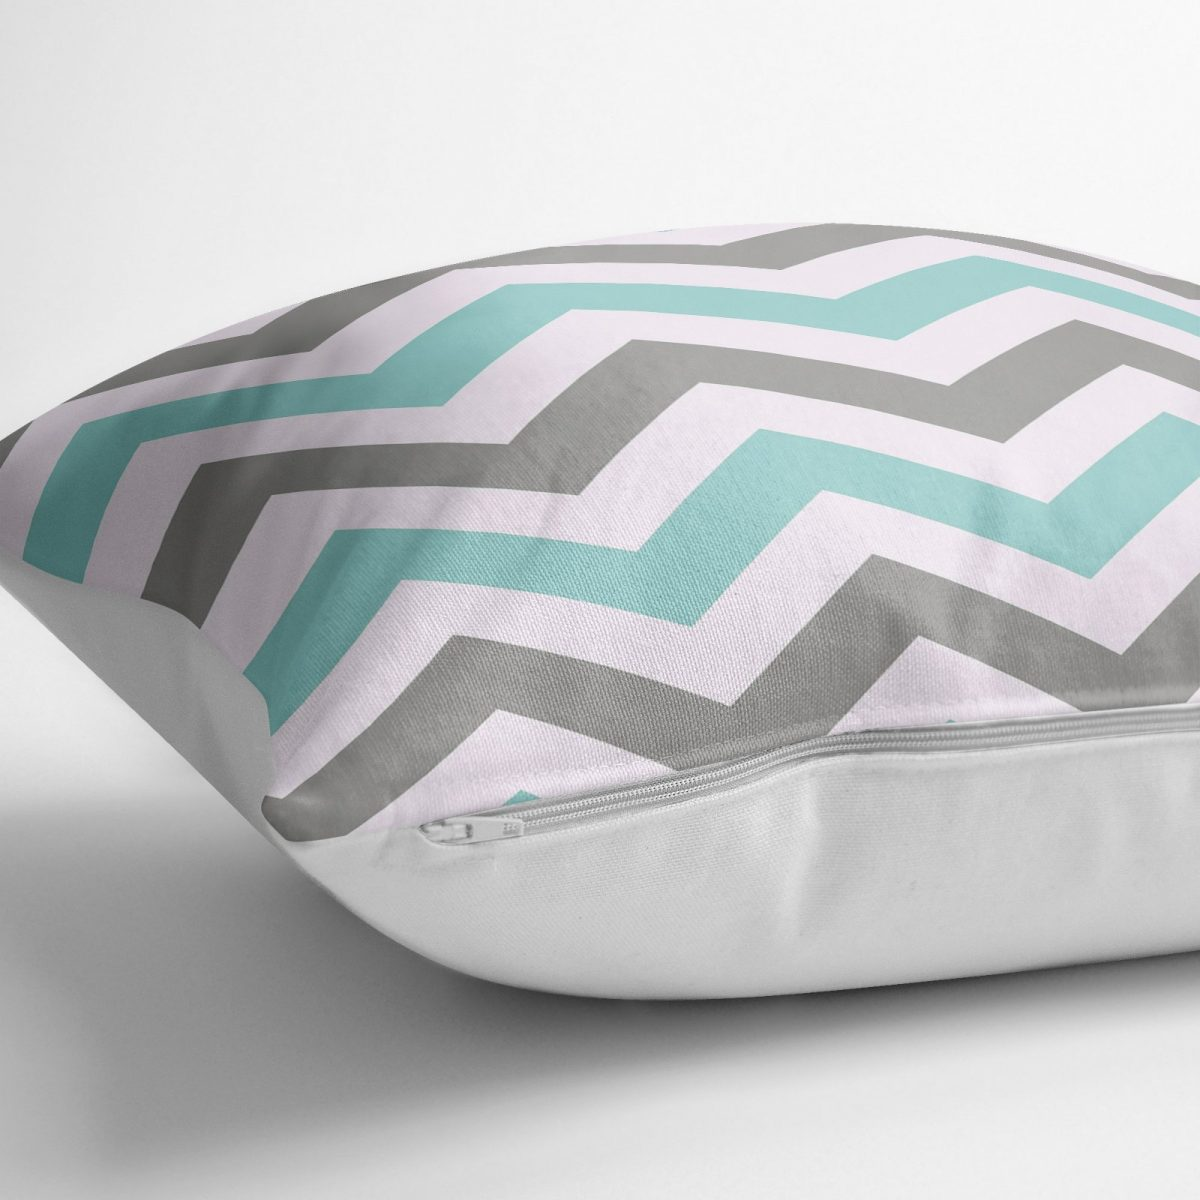 Turkuaz Gri Zigzag Desenli Dijital Baskılı Modern Yer Minderi - 70 x 70 cm Realhomes